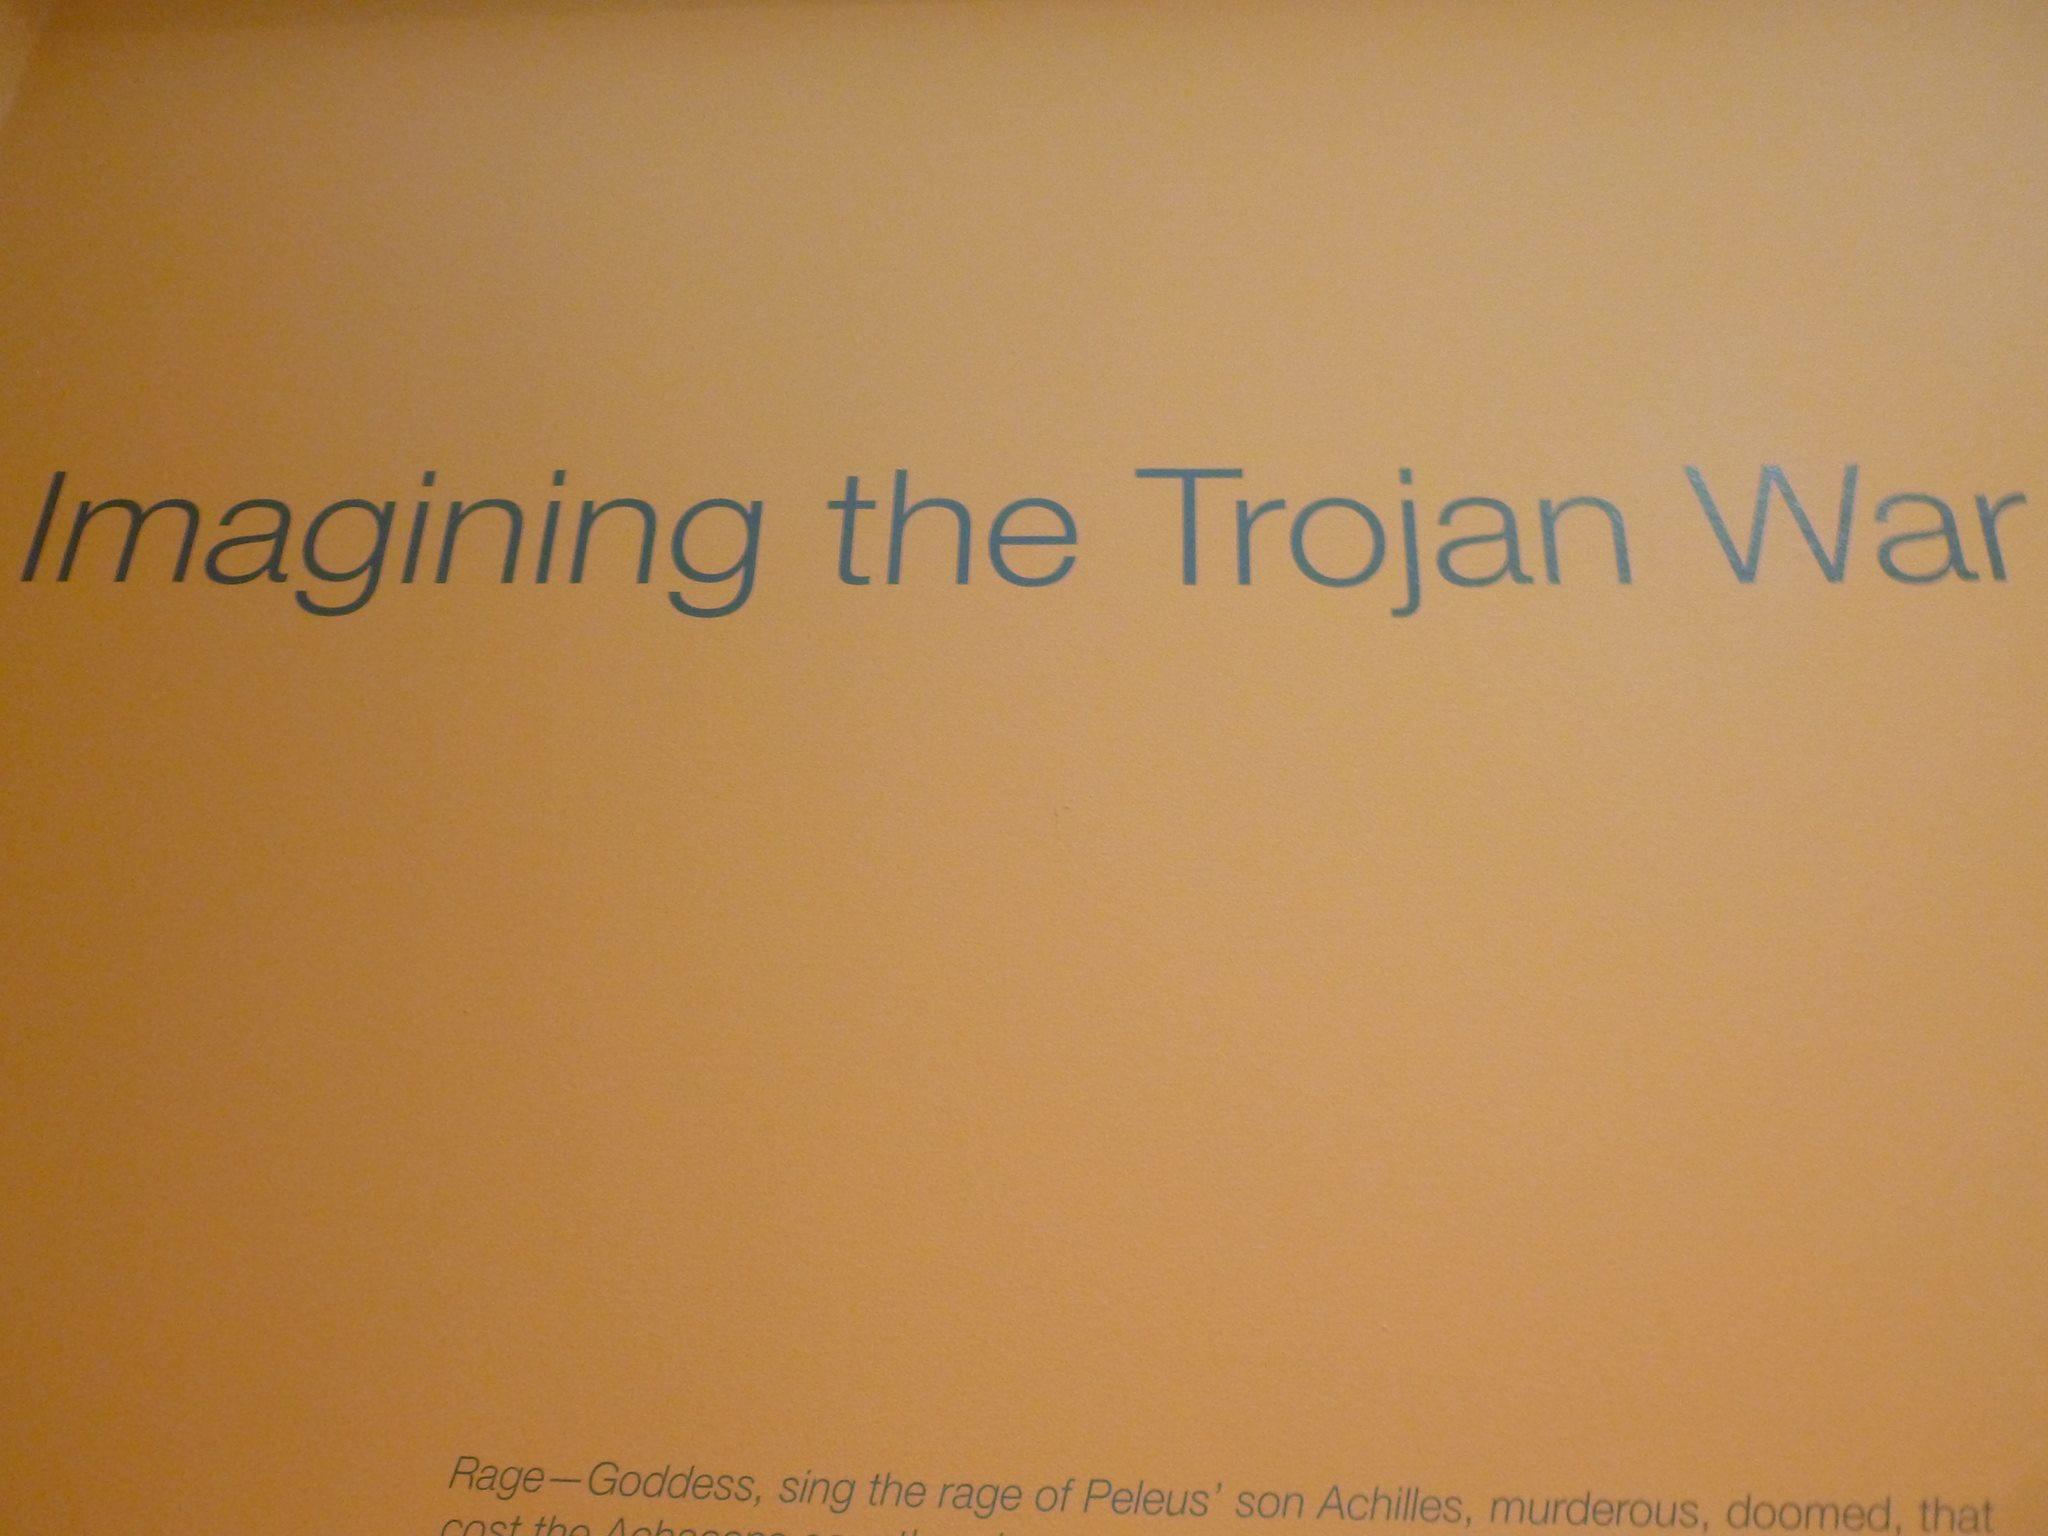 Imagining the Trojan War.jpg